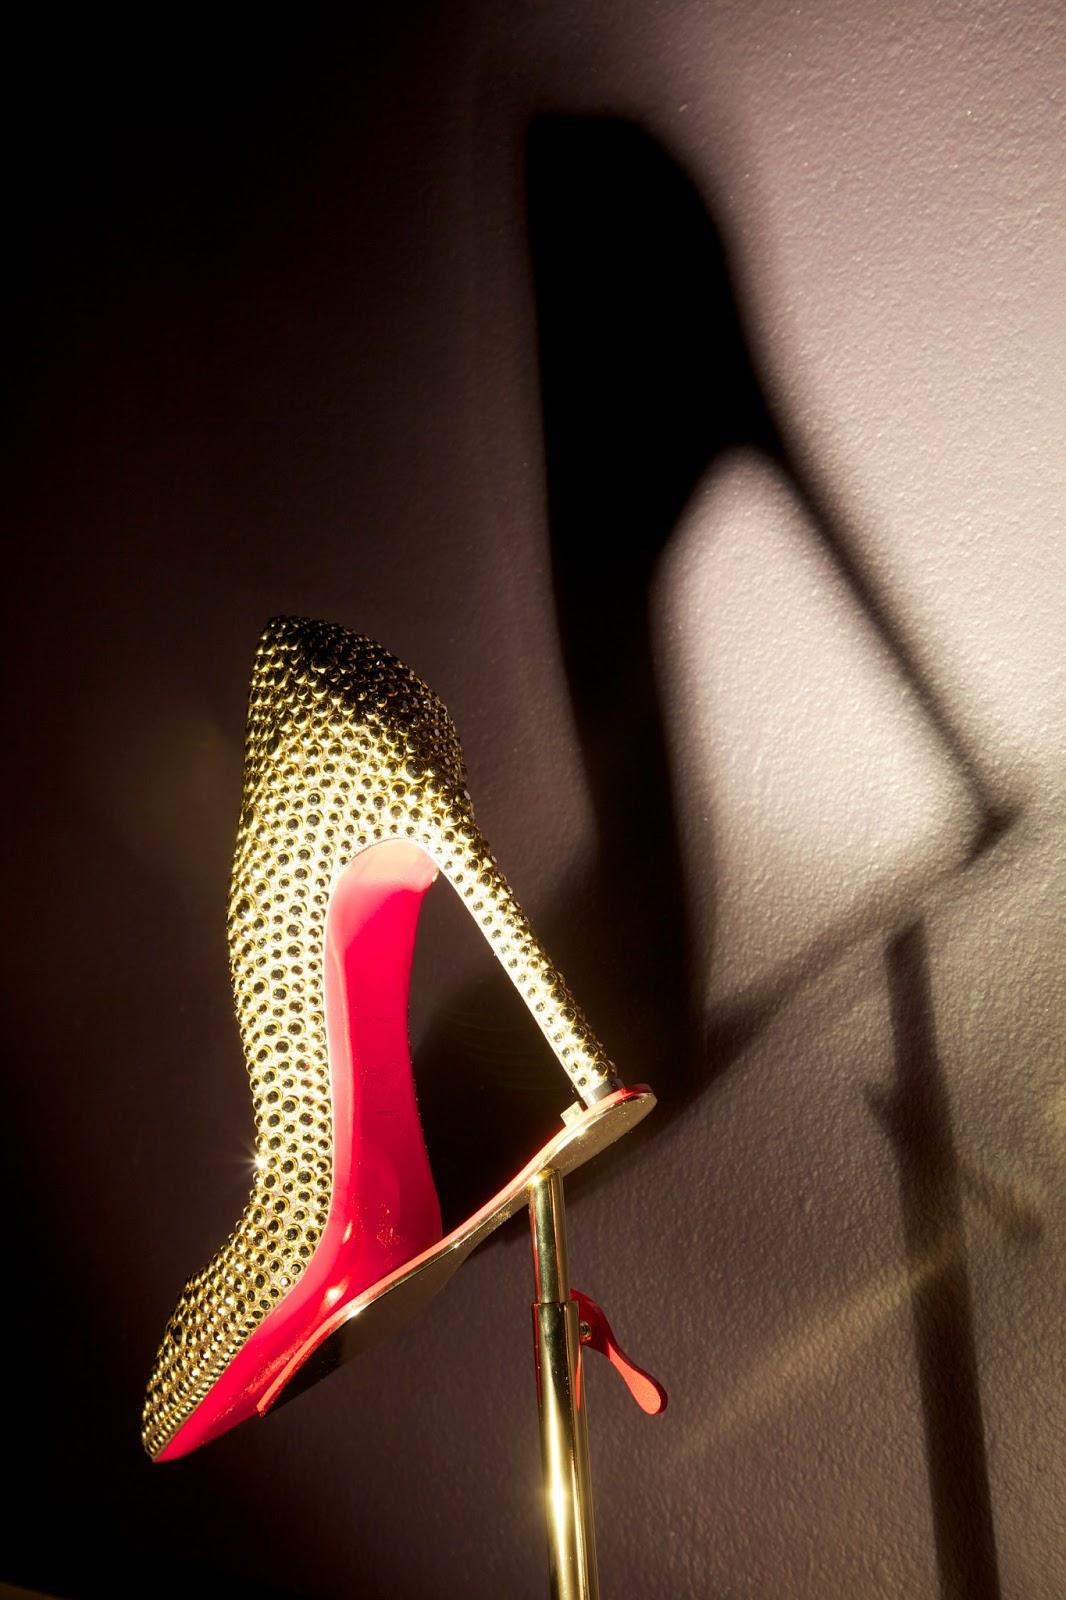 5981d940c01 Toronto's Design Exchange (DX) exhibition celebrates French shoe ...